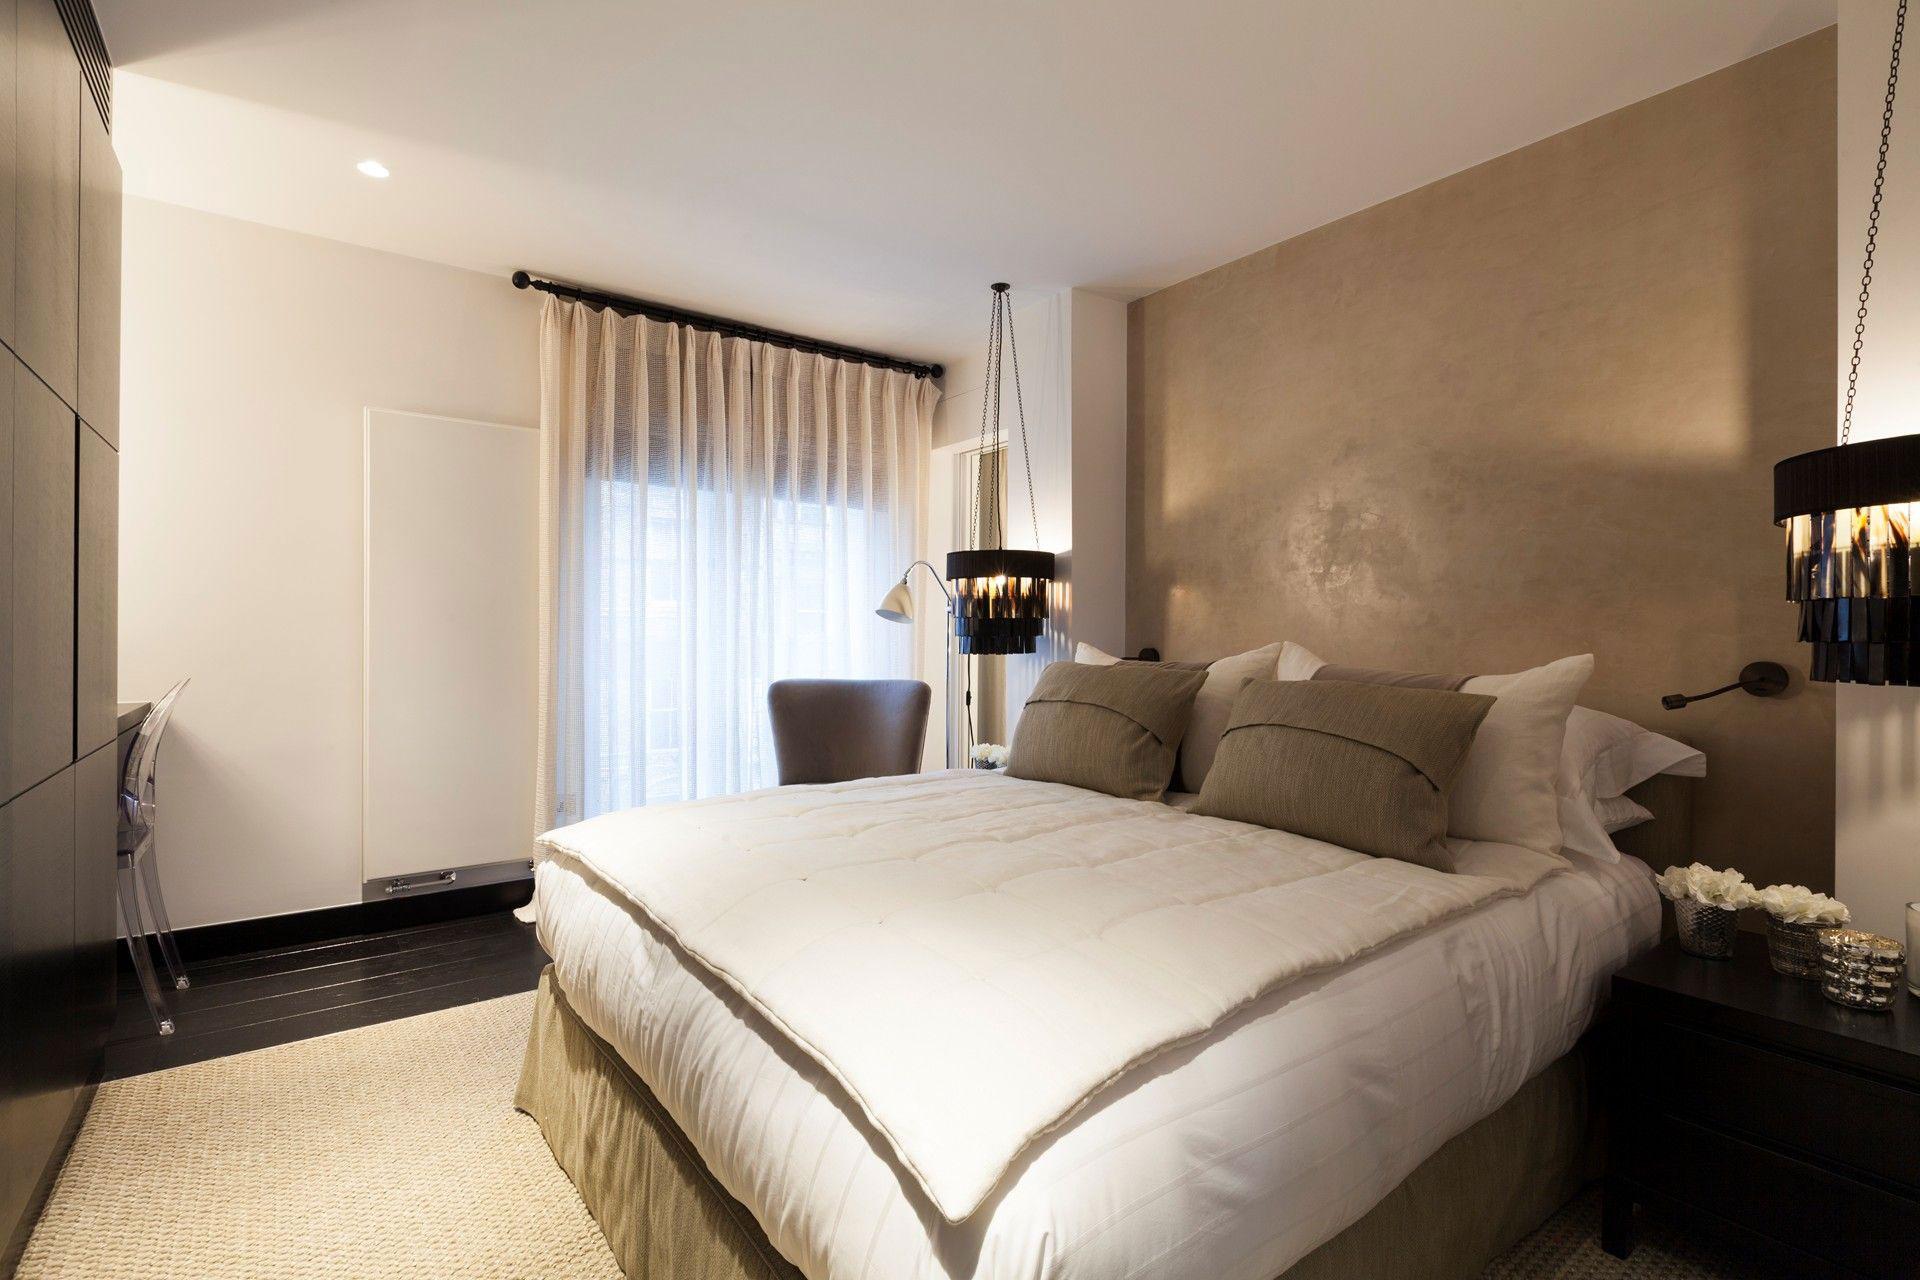 Bedroom, Lighting, Henrietta Street Apartment